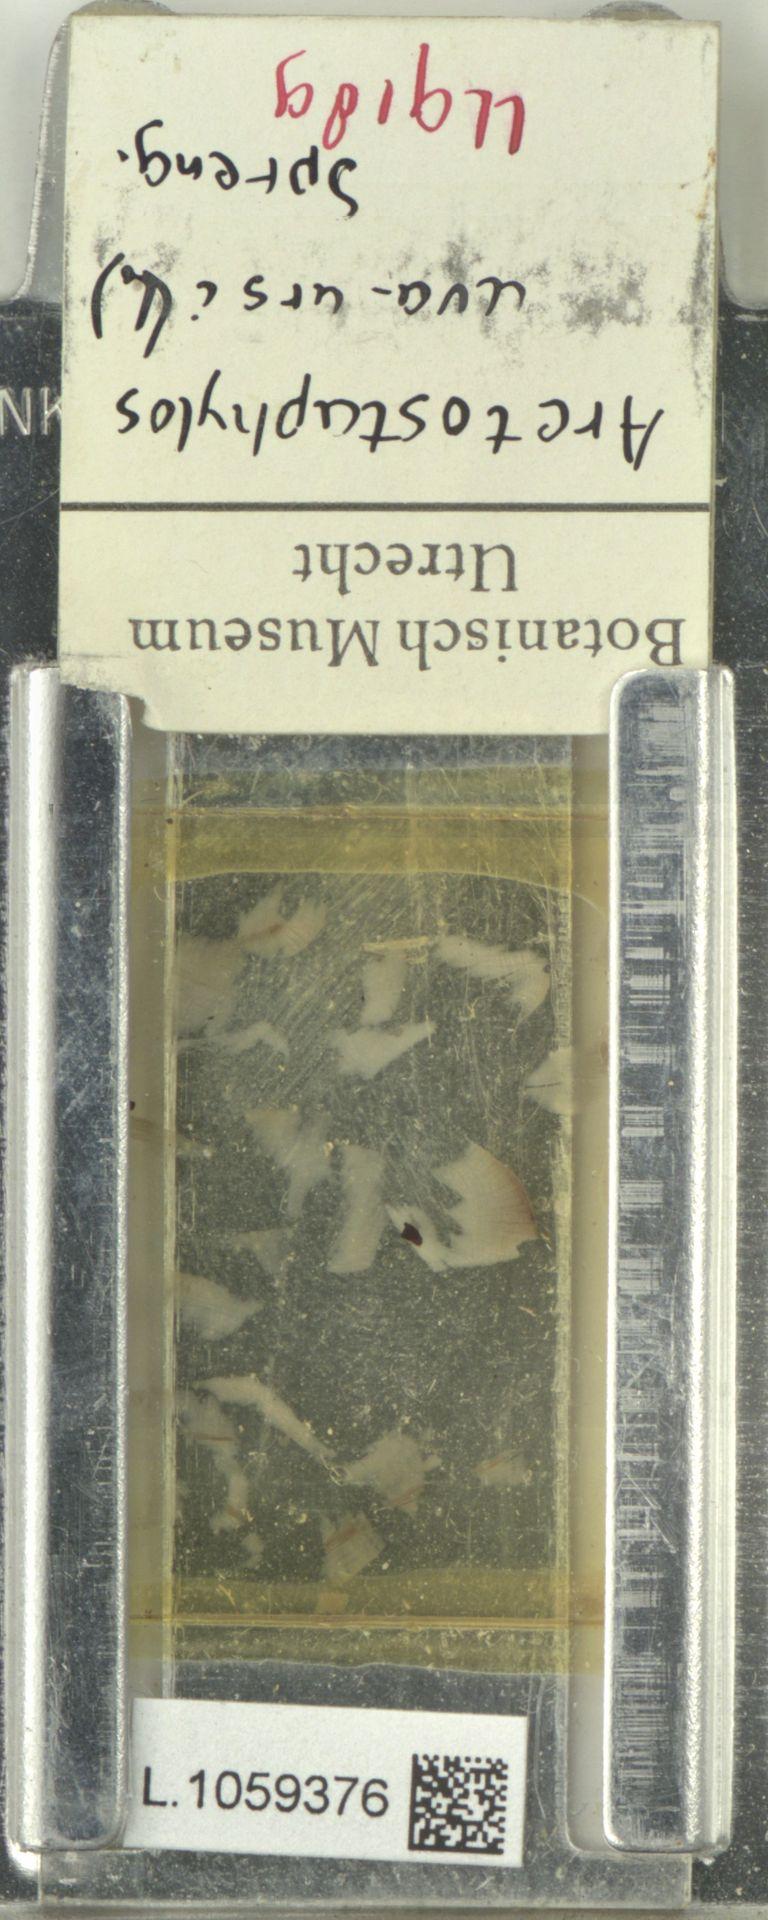 L.1059376 | Arctostaphylos uva-ursi (L.) Spreng.